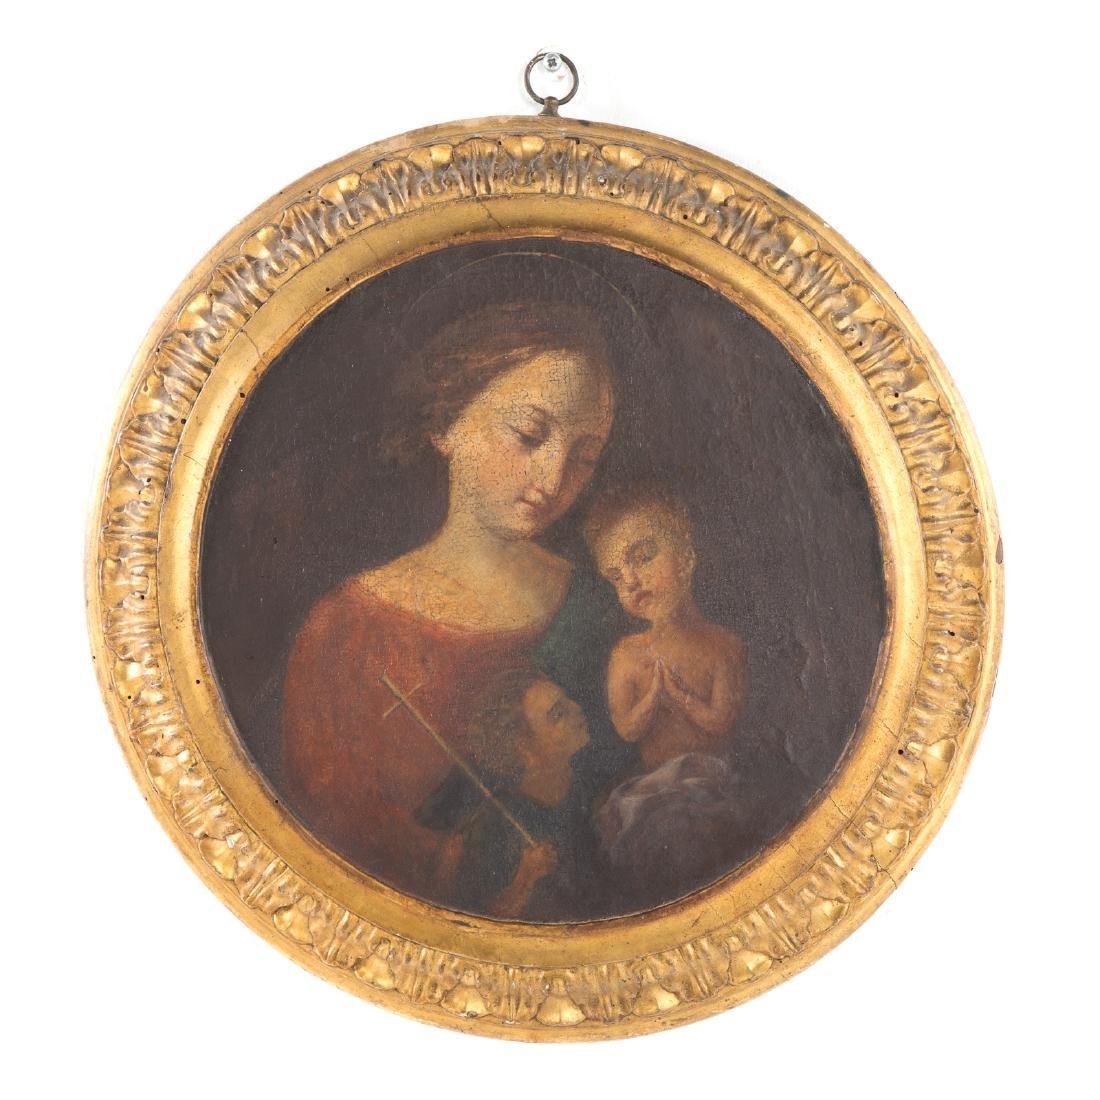 Italian School, 17th century. Madonna and Child